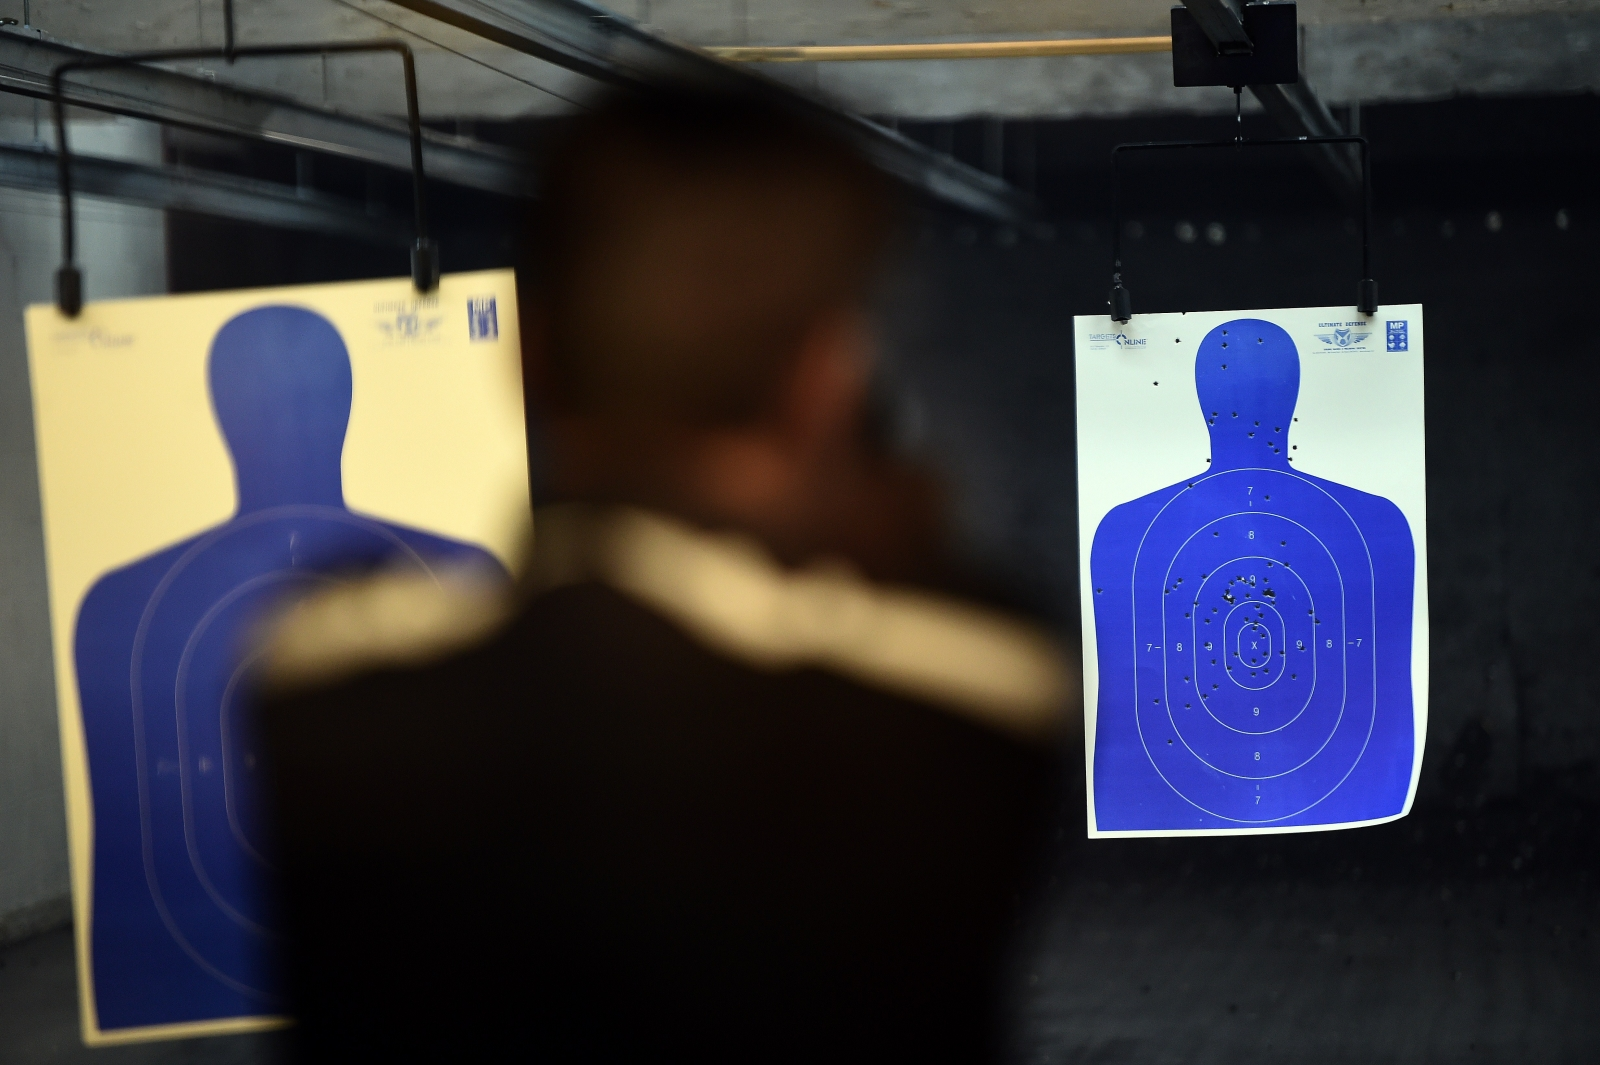 Gun range generic